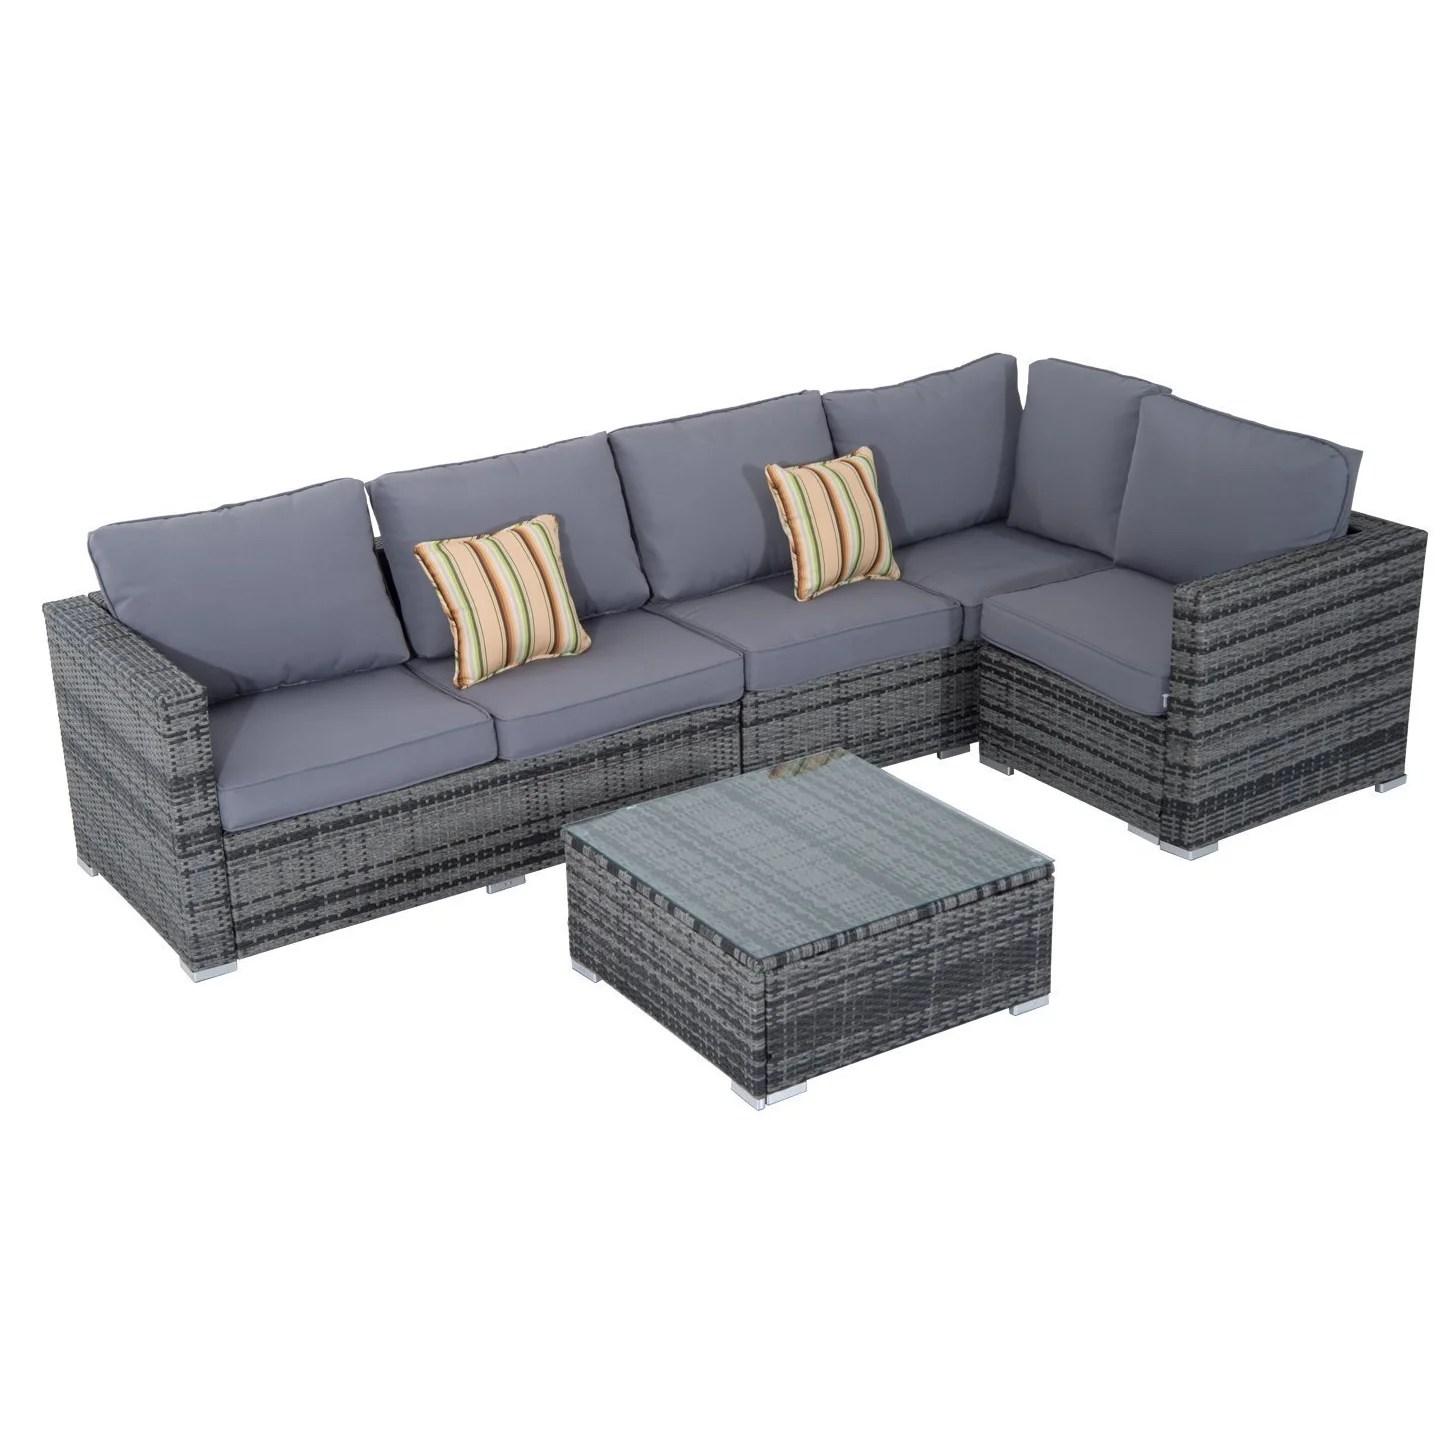 cushion sofa set lafer 4 seater with wayfair uk